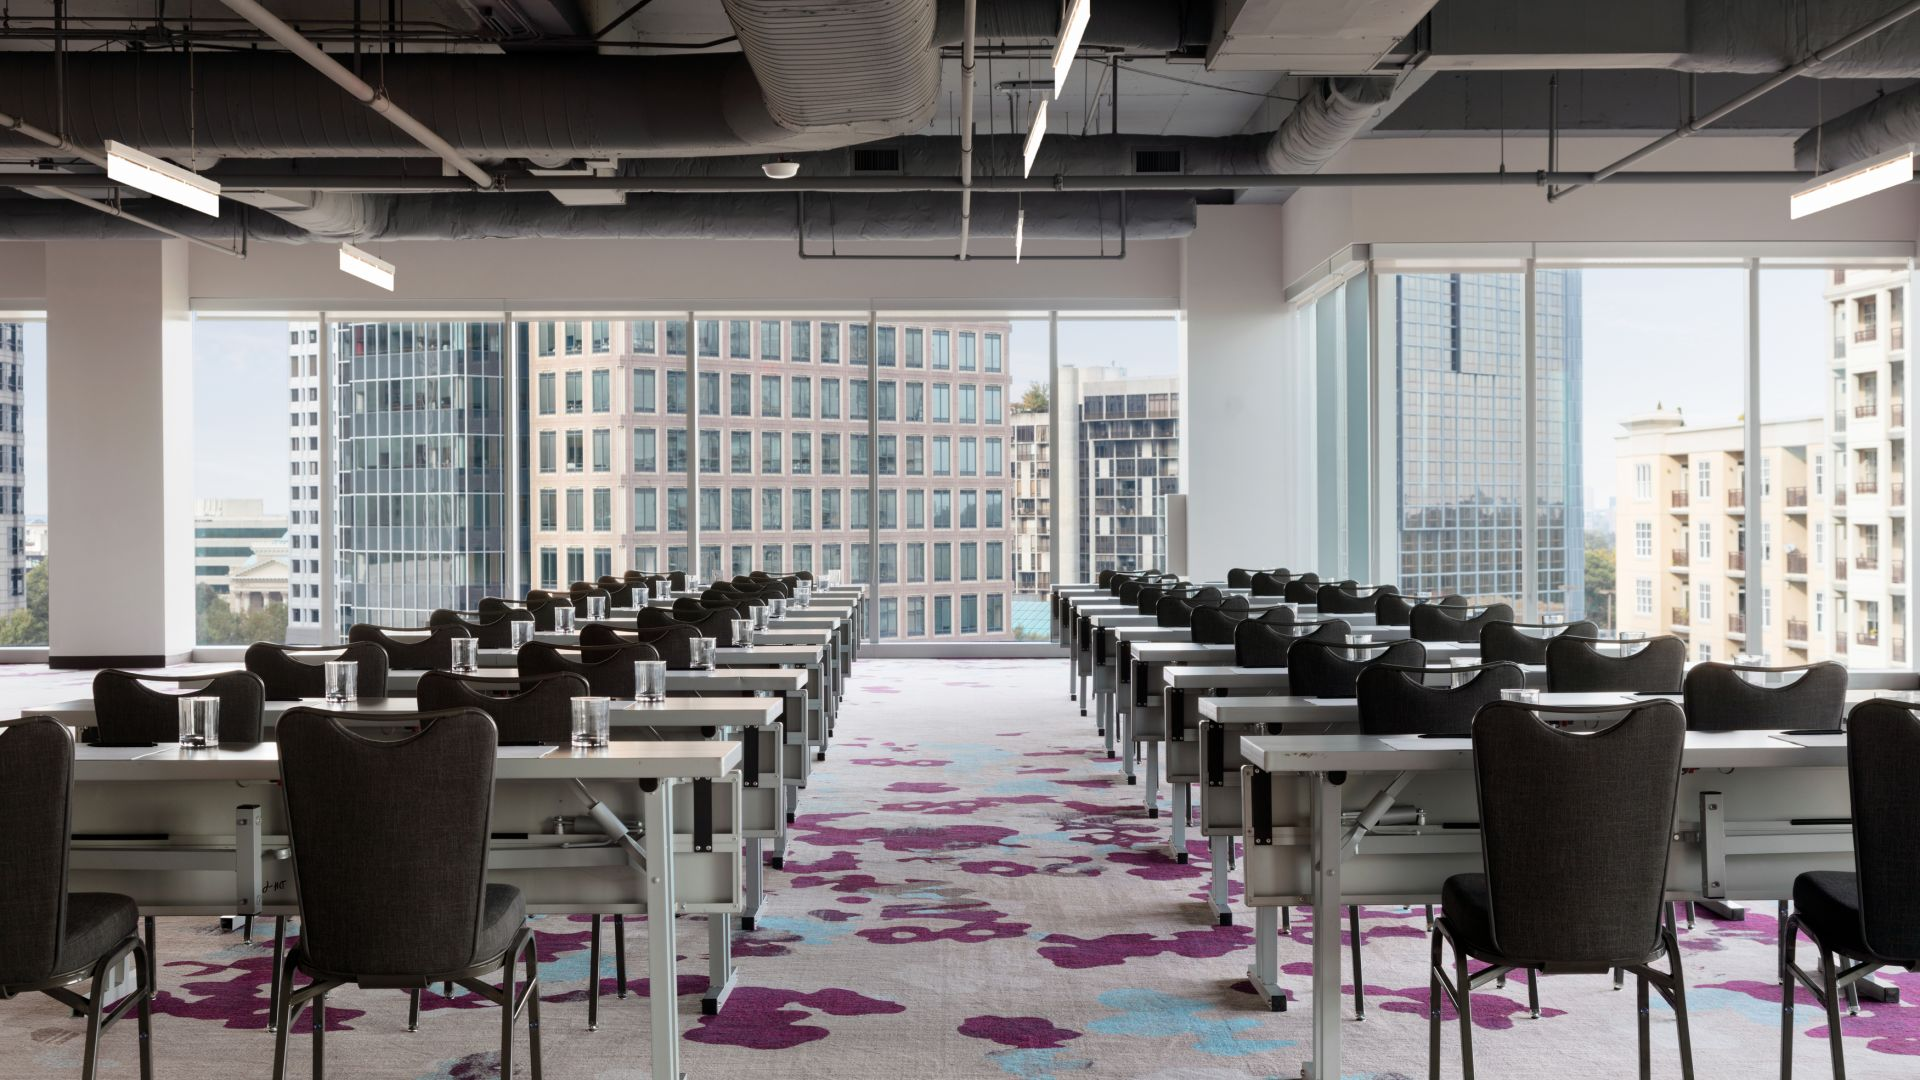 Sala de reuniones Overlook West en el Loews Atlanta Hotel